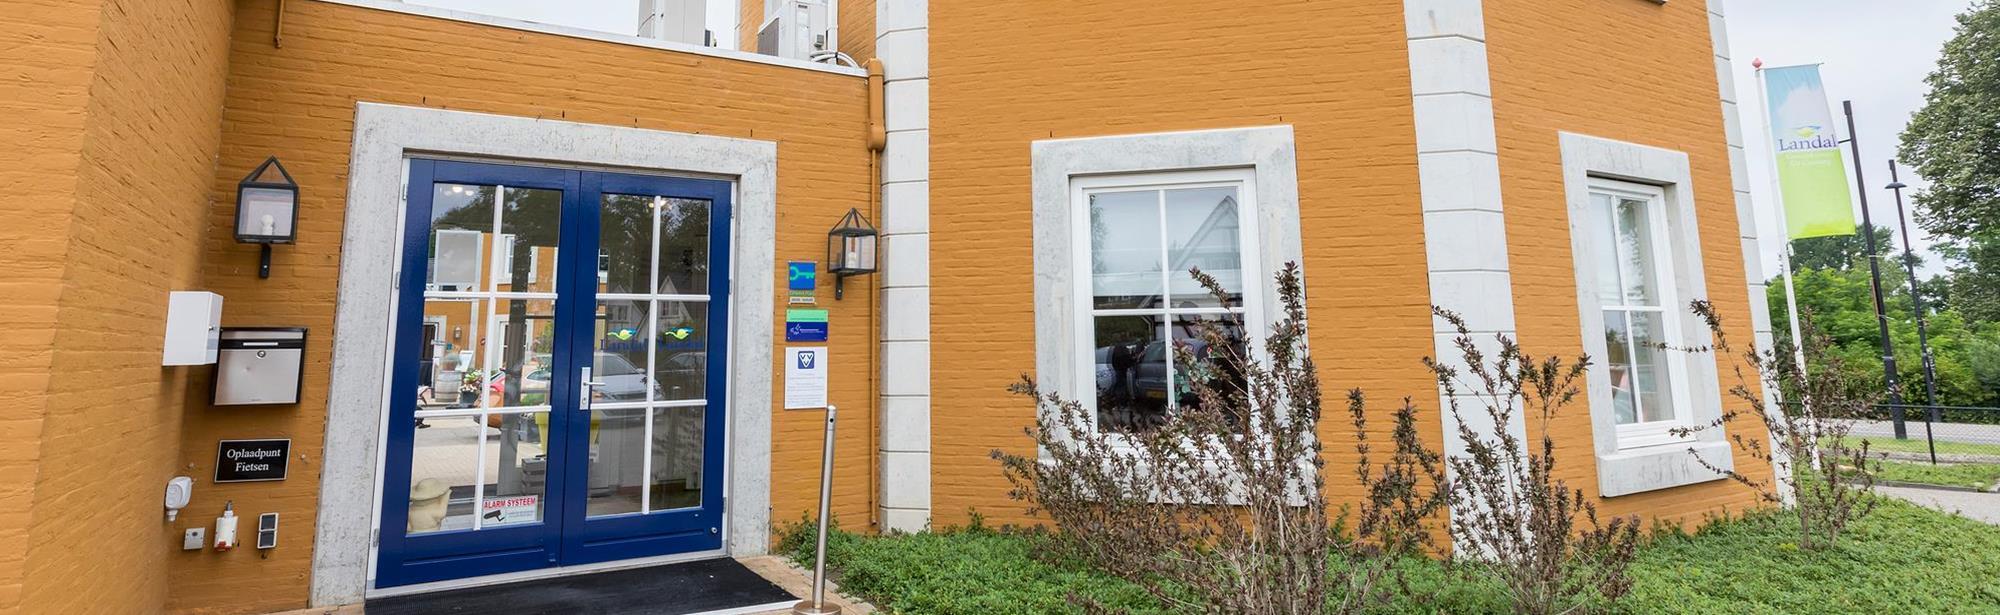 Visit Zuid-Limburg Folderpost Landal kasteelddomein de Cauberg